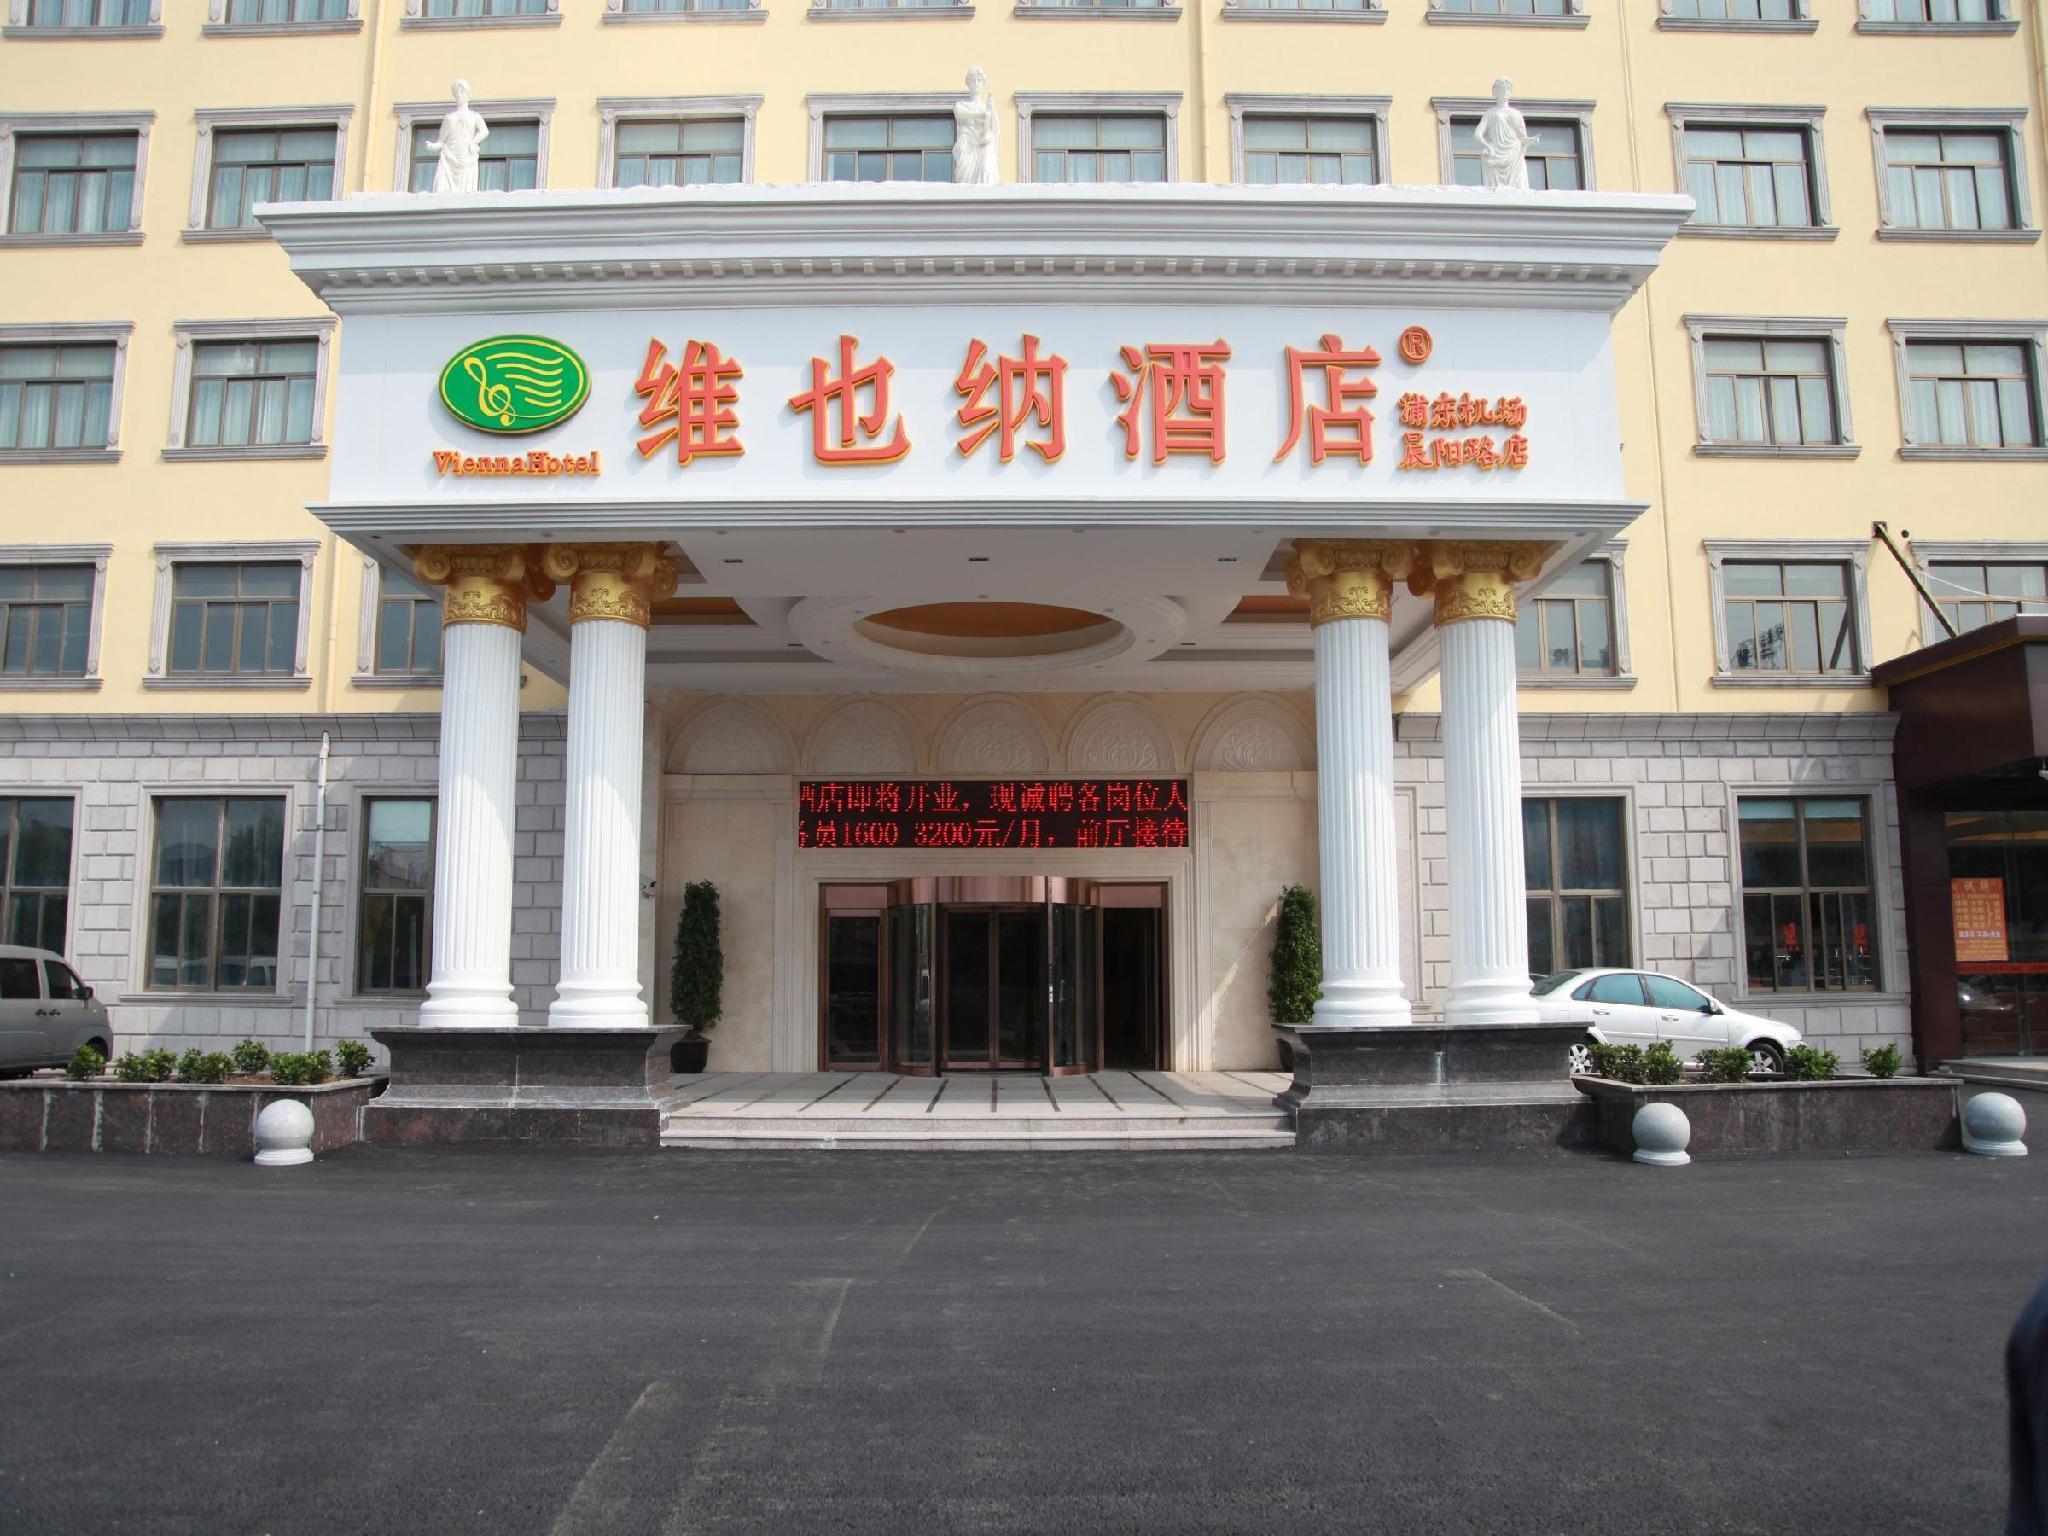 Vienna Hotel - Shanghai Pvg Branch, Shanghai